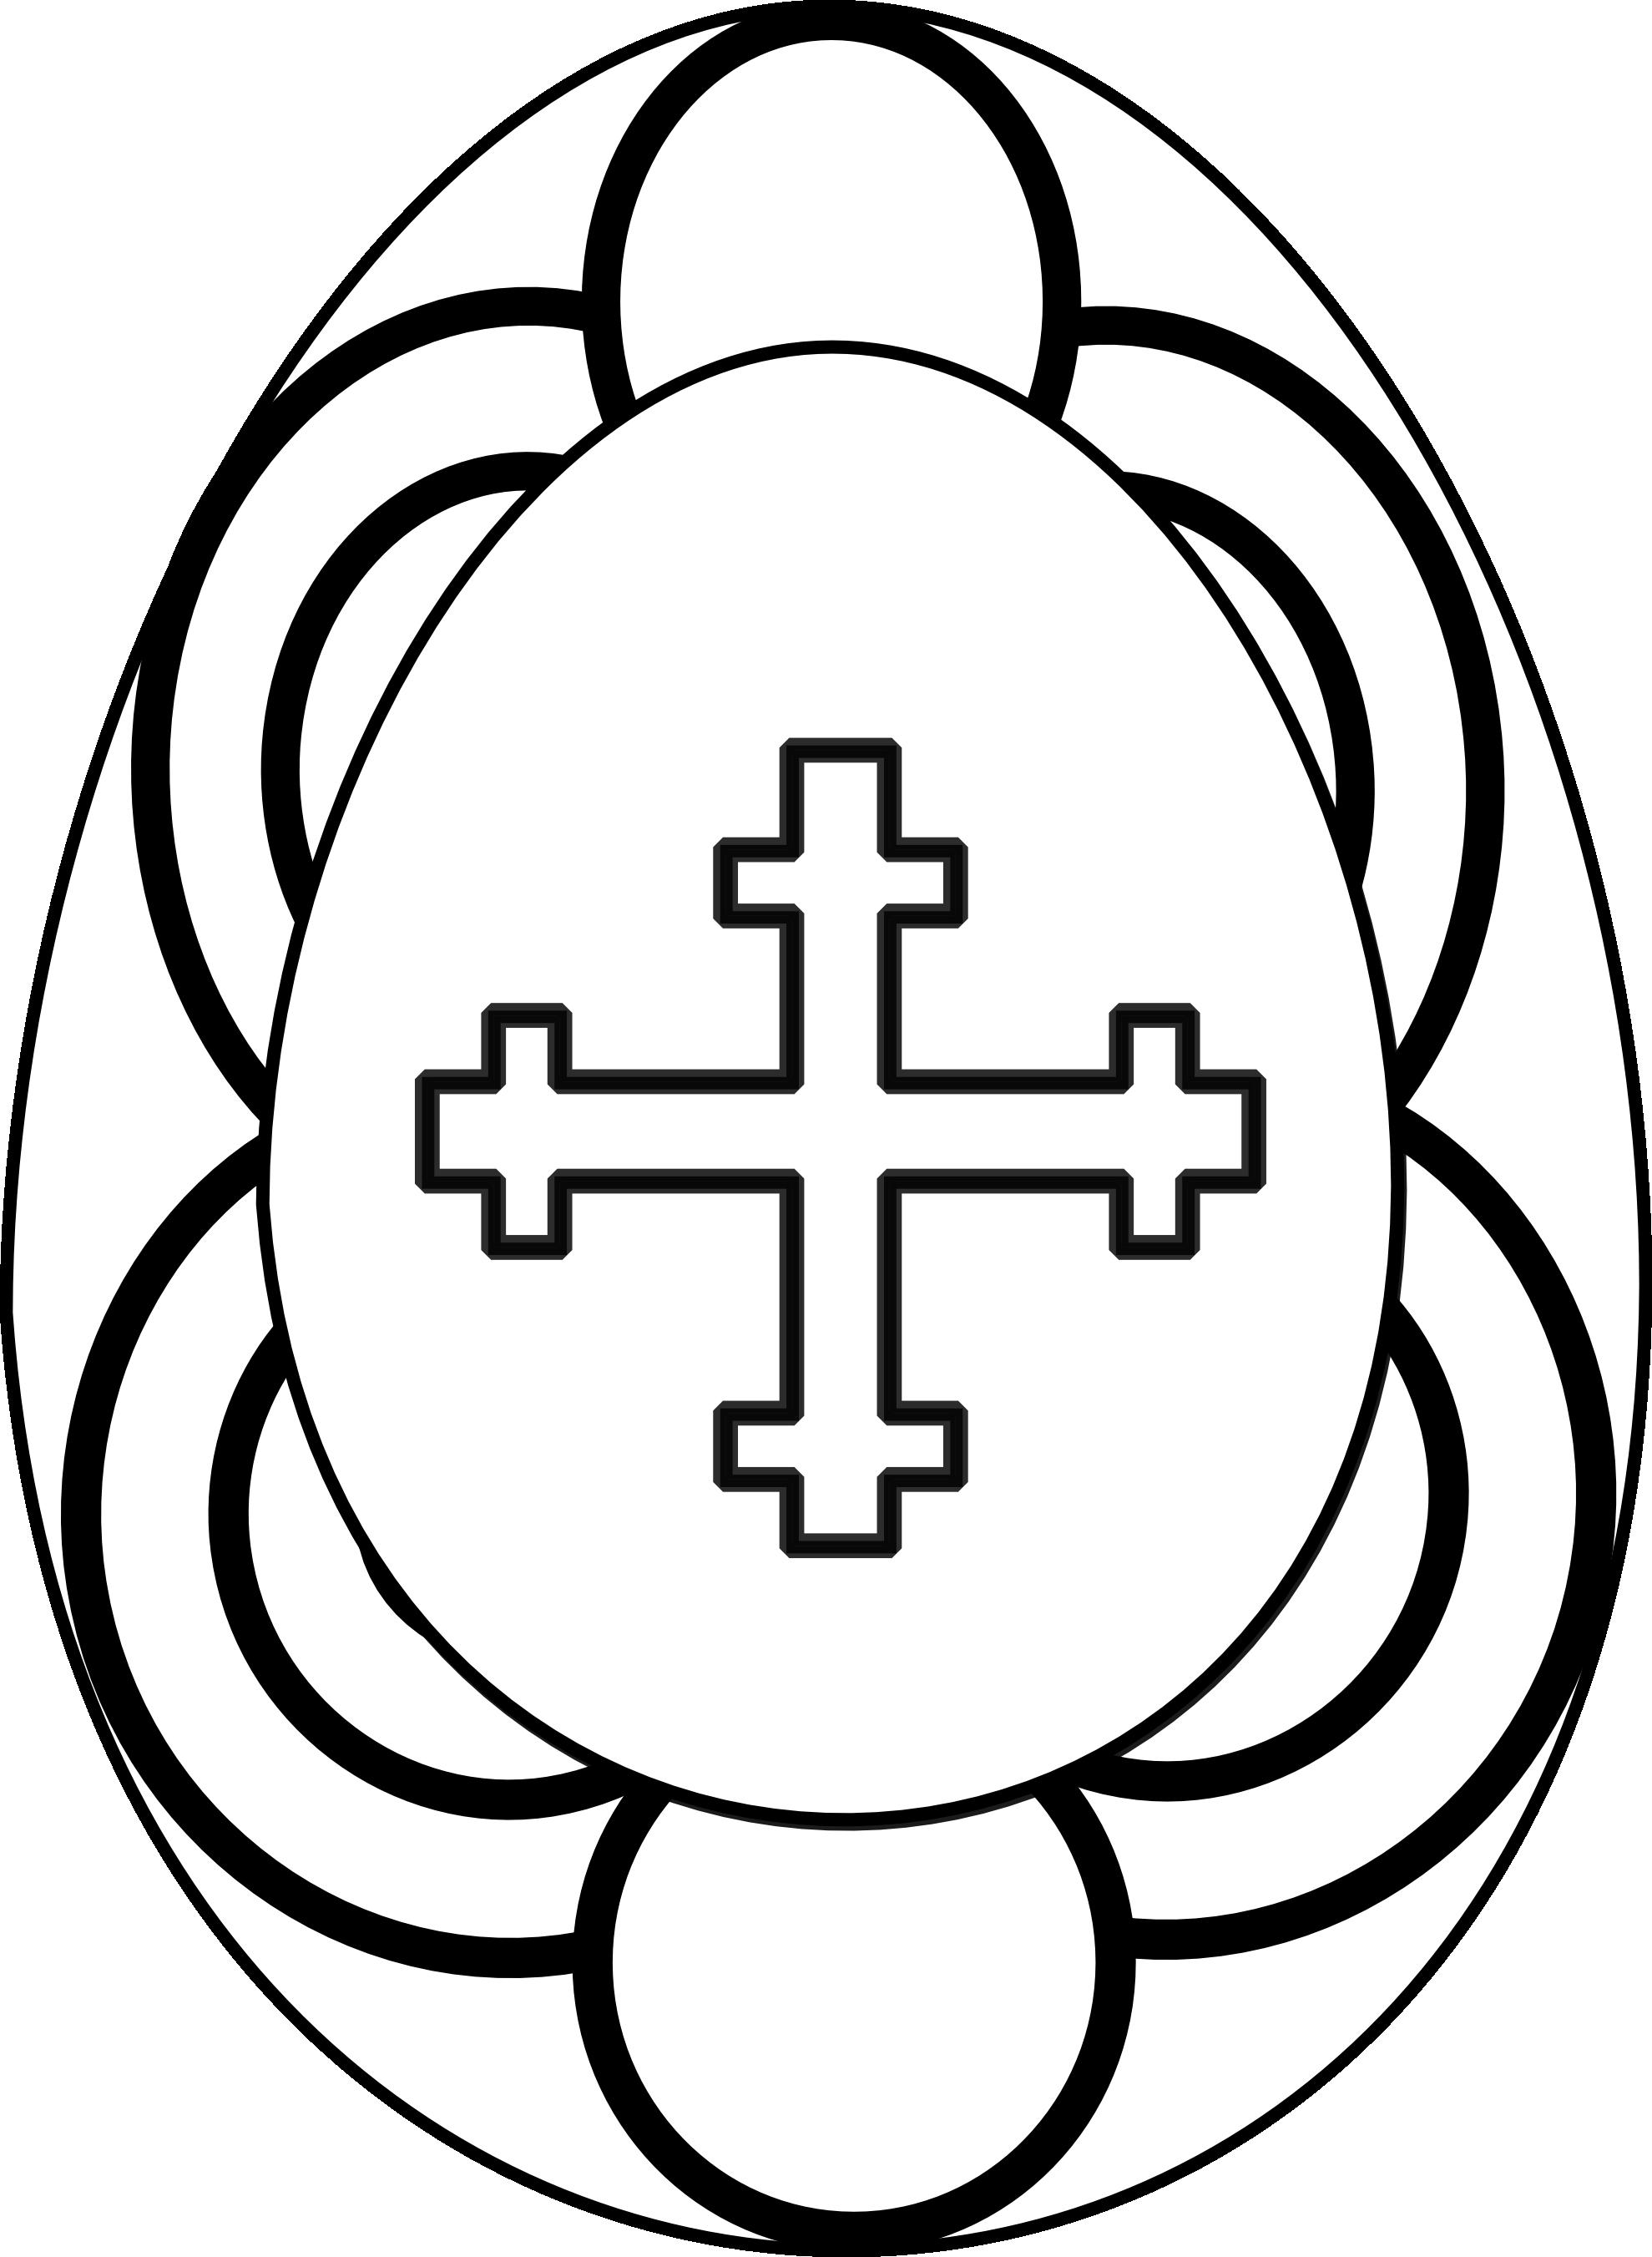 Easter Black & White Clipart Christian - ClipArt Best Easter Clipart Free Black And White